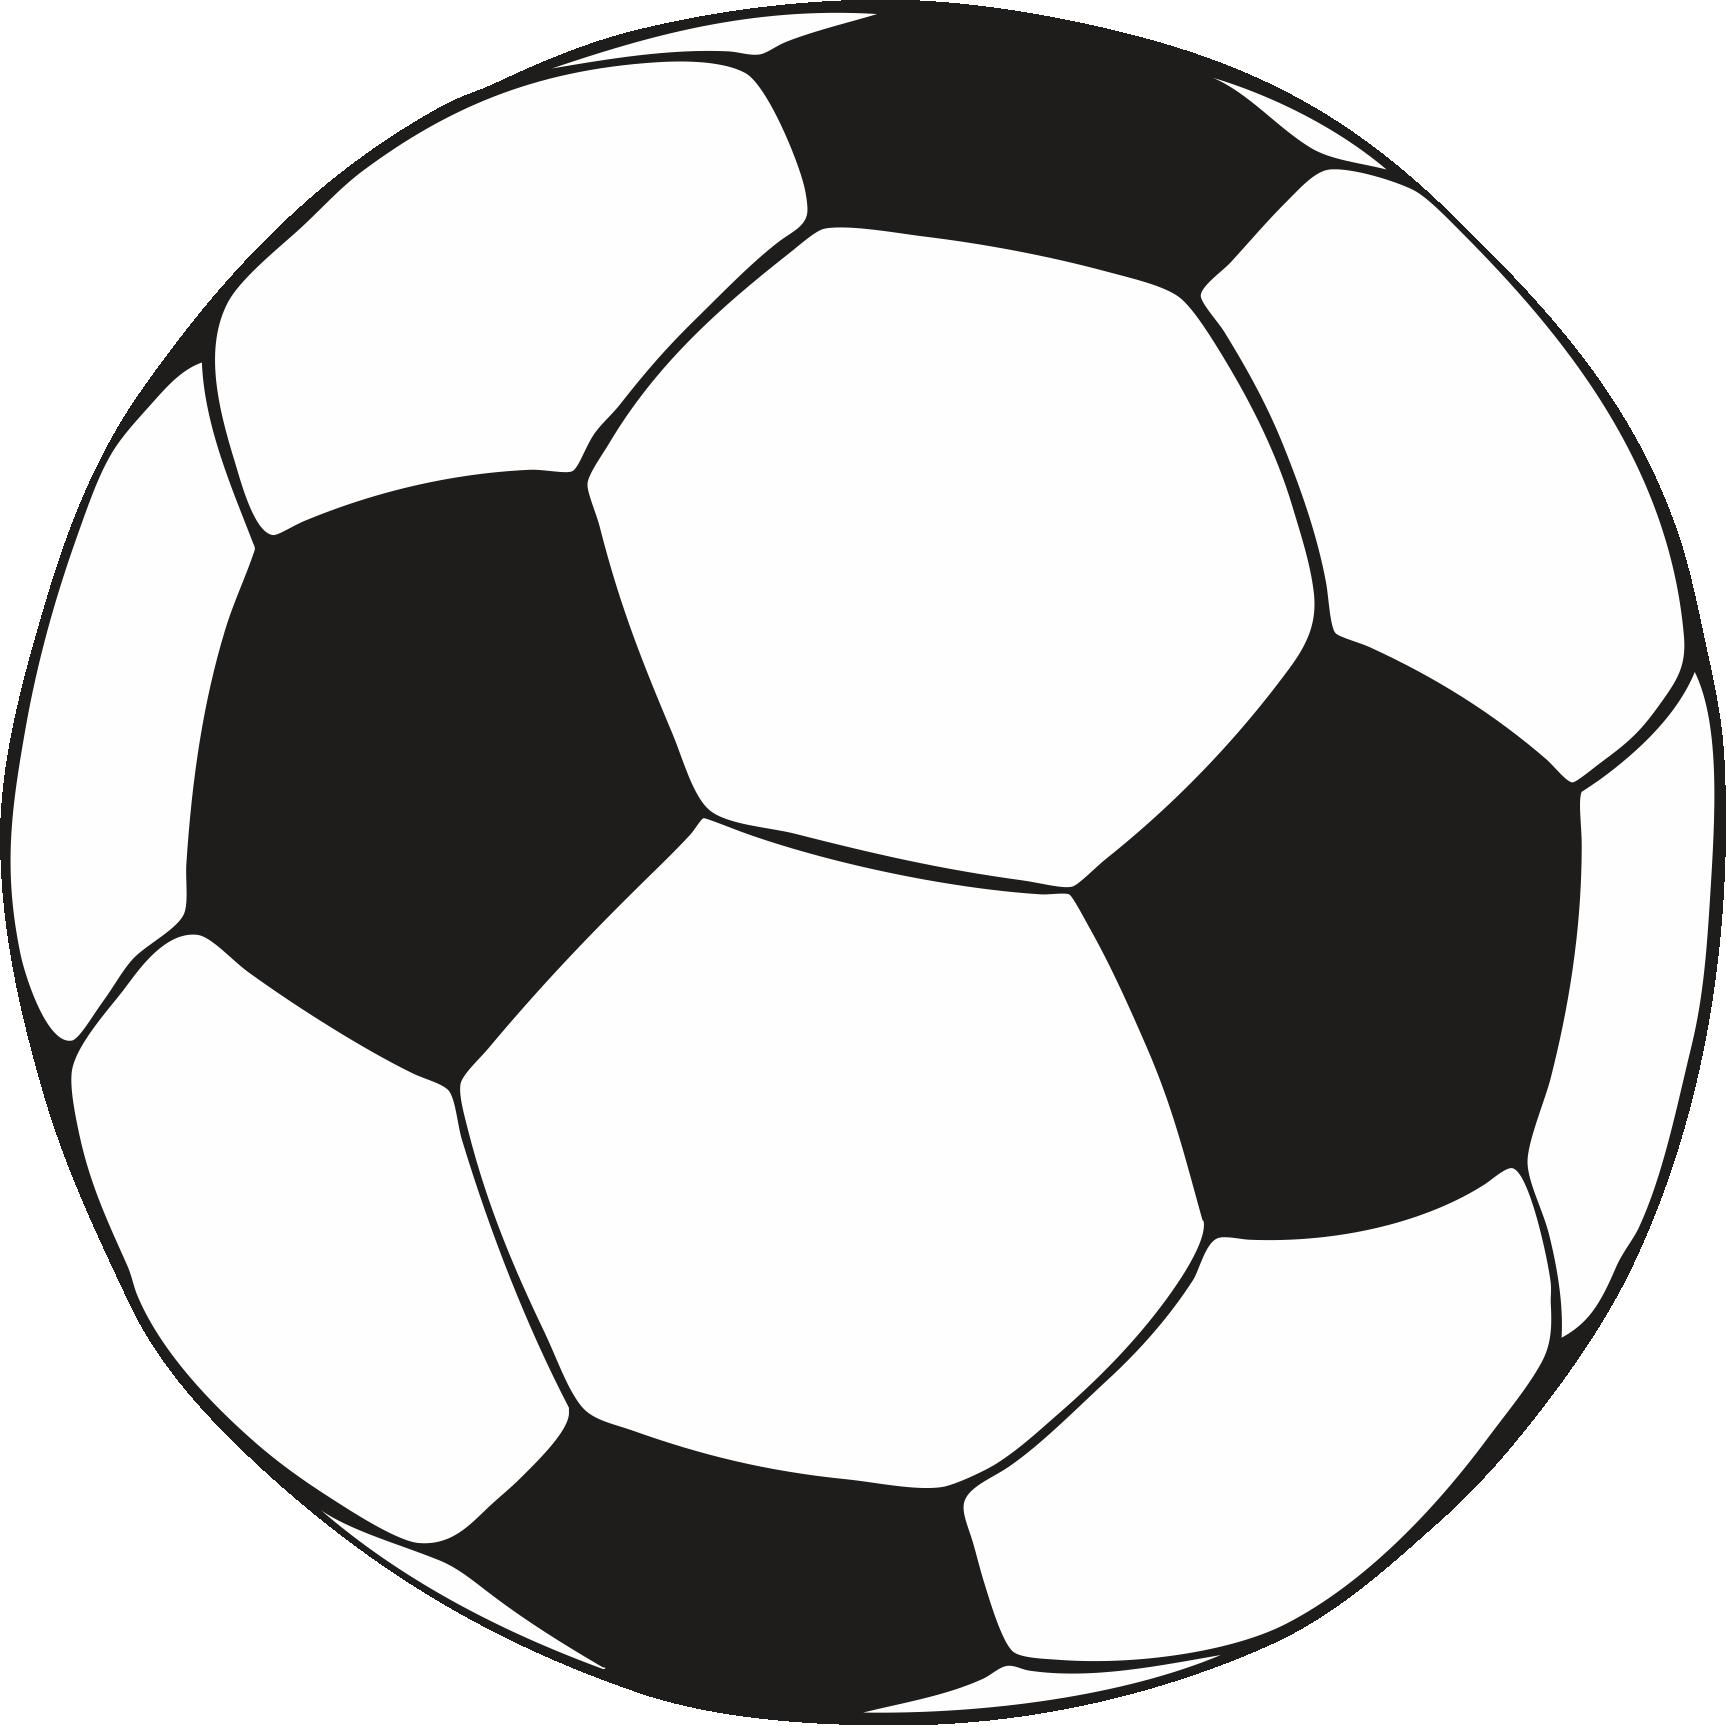 Soccer Ball Colouring